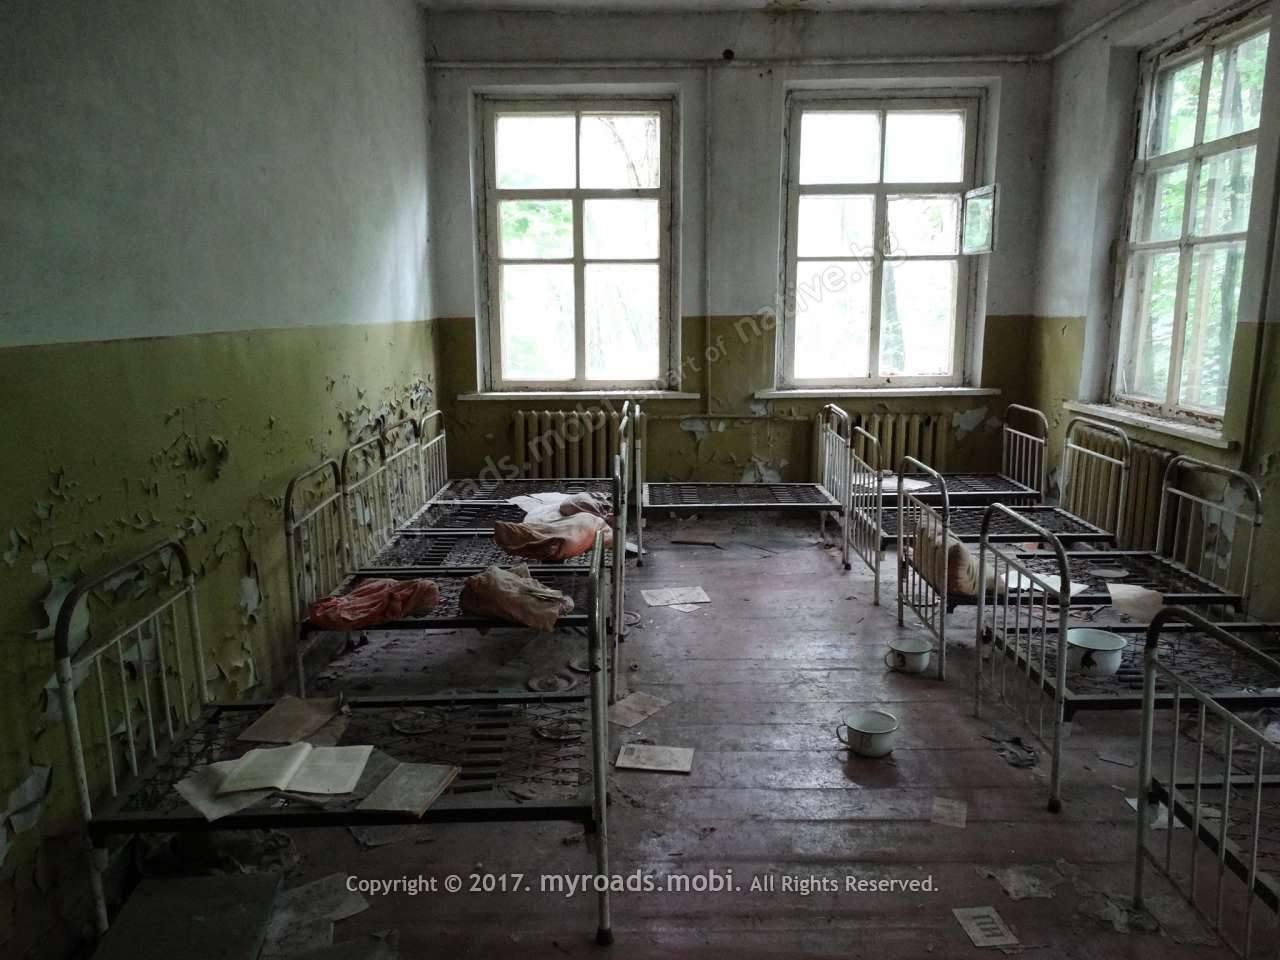 chernobil-pripyat-myroadsmobi-georgi-ivanov (20)